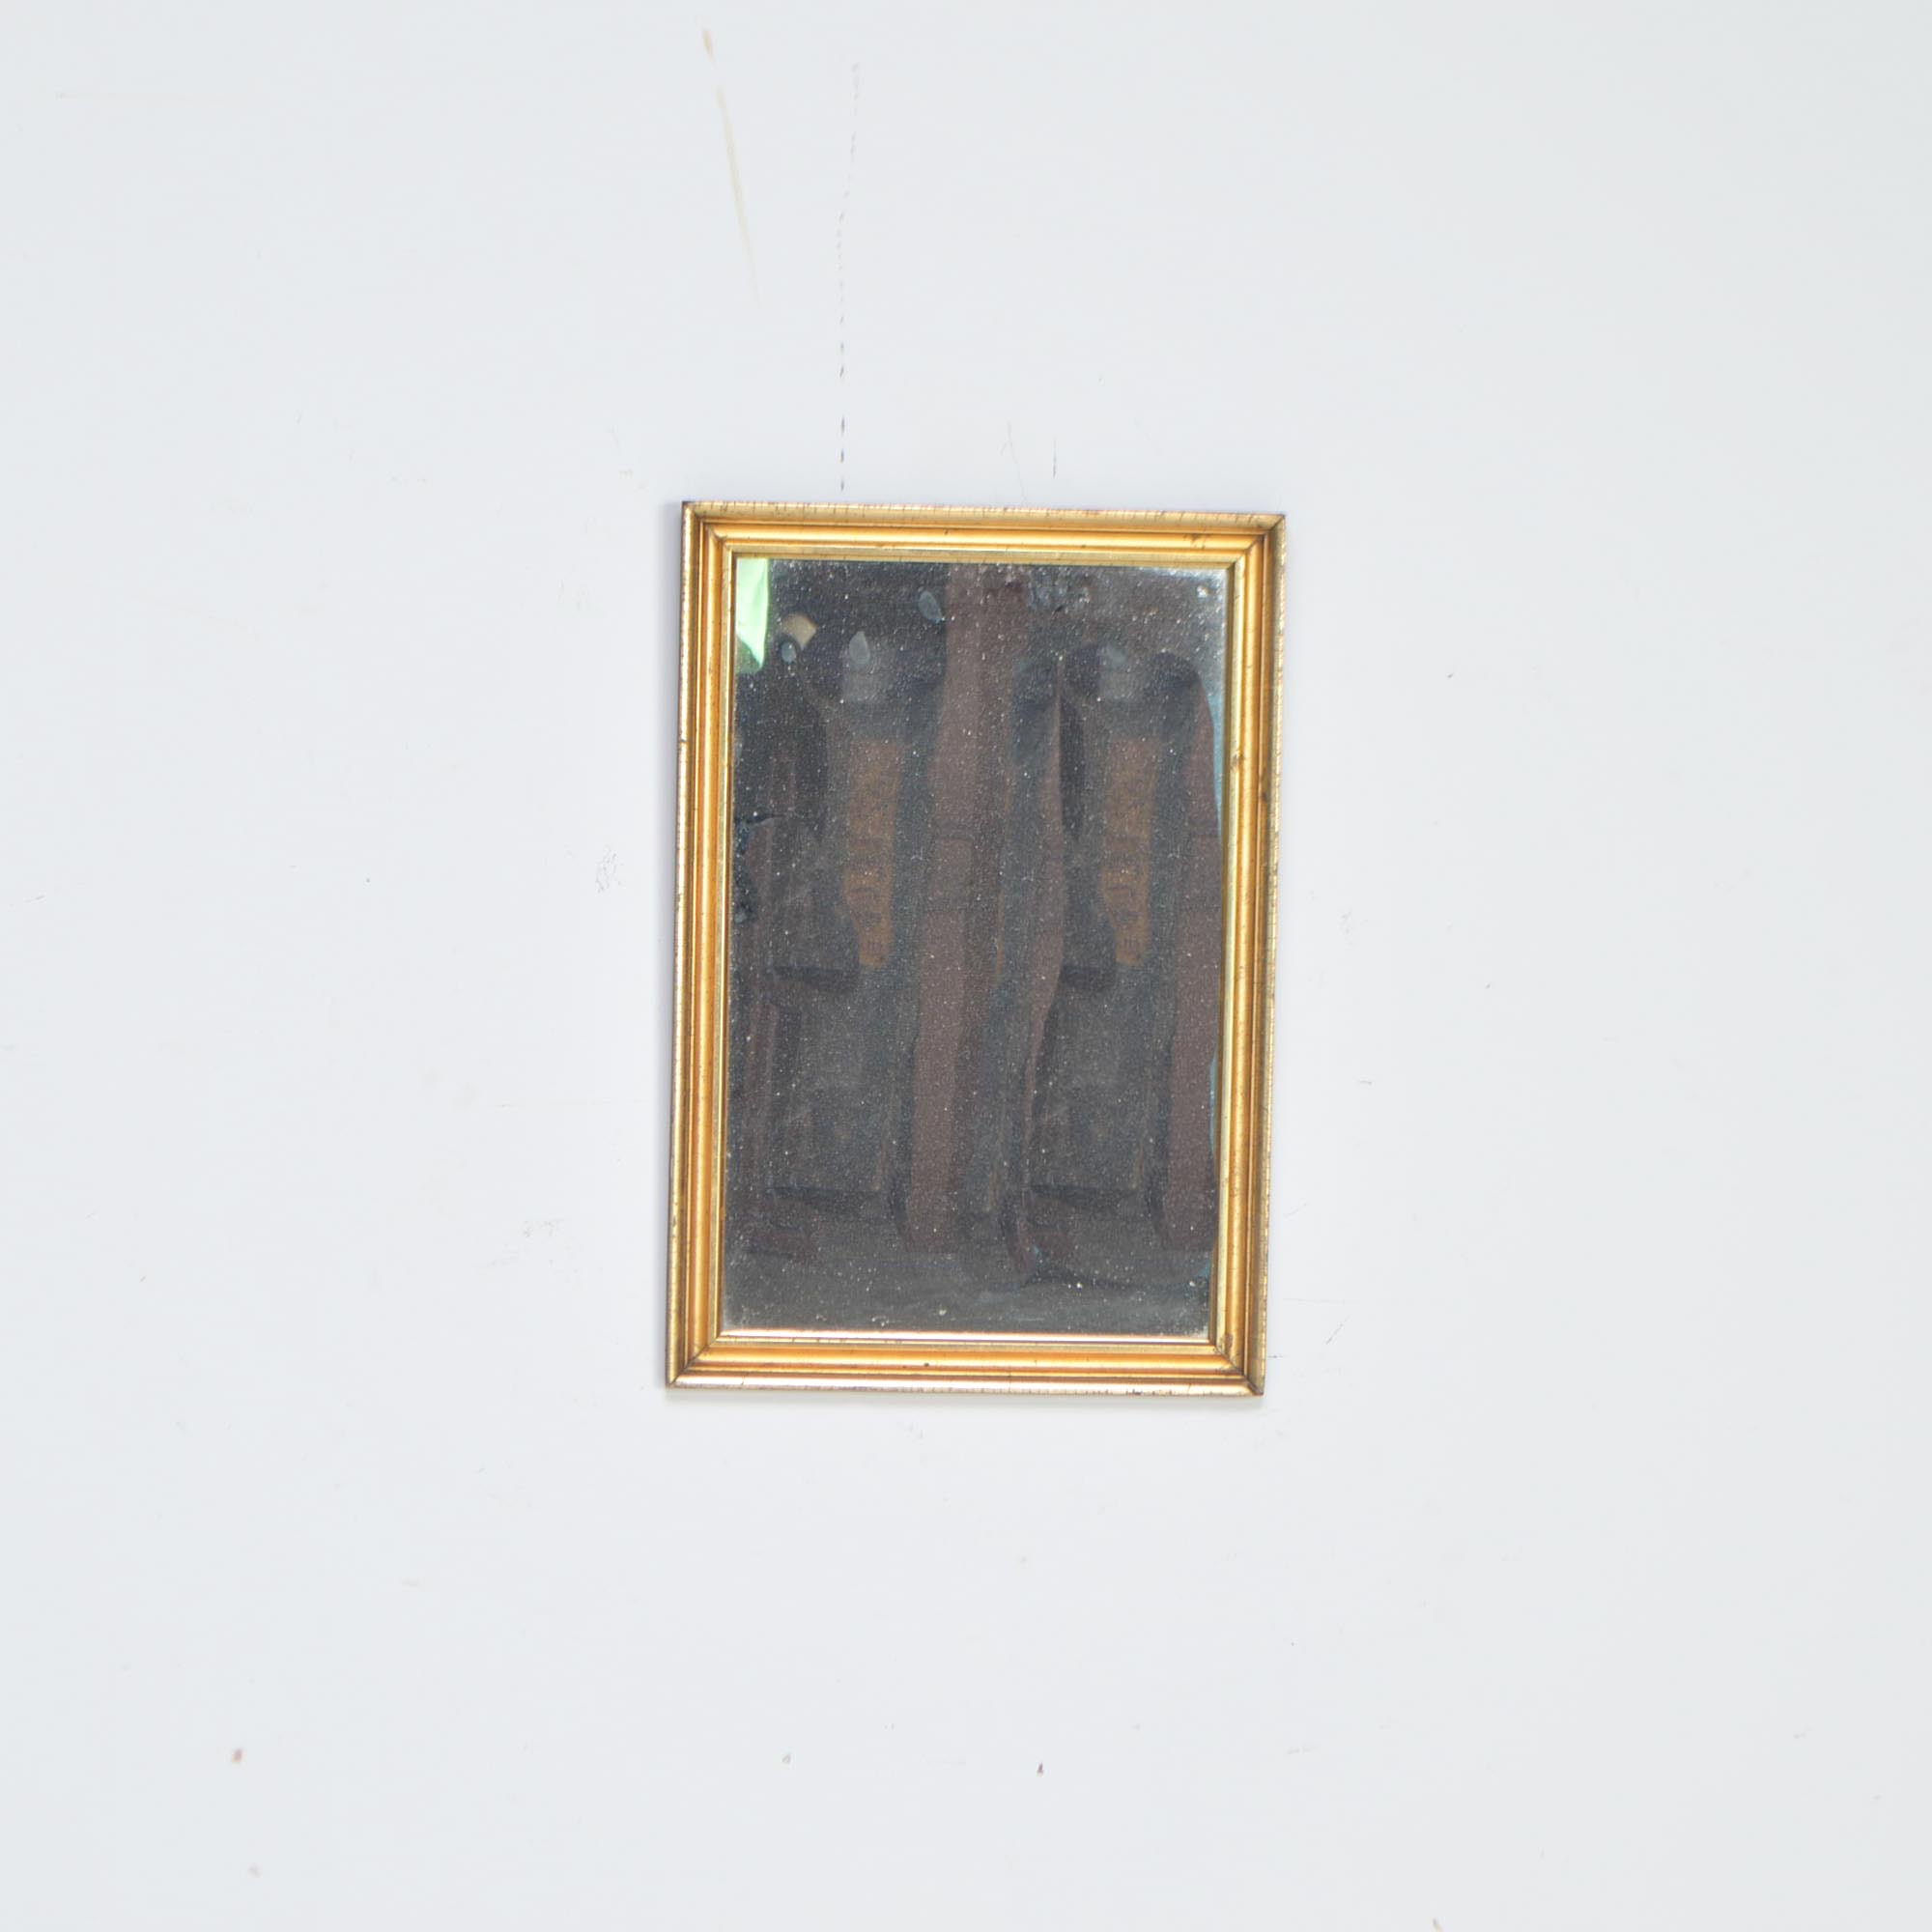 Vintage Gilt-Toned Wall Mirror